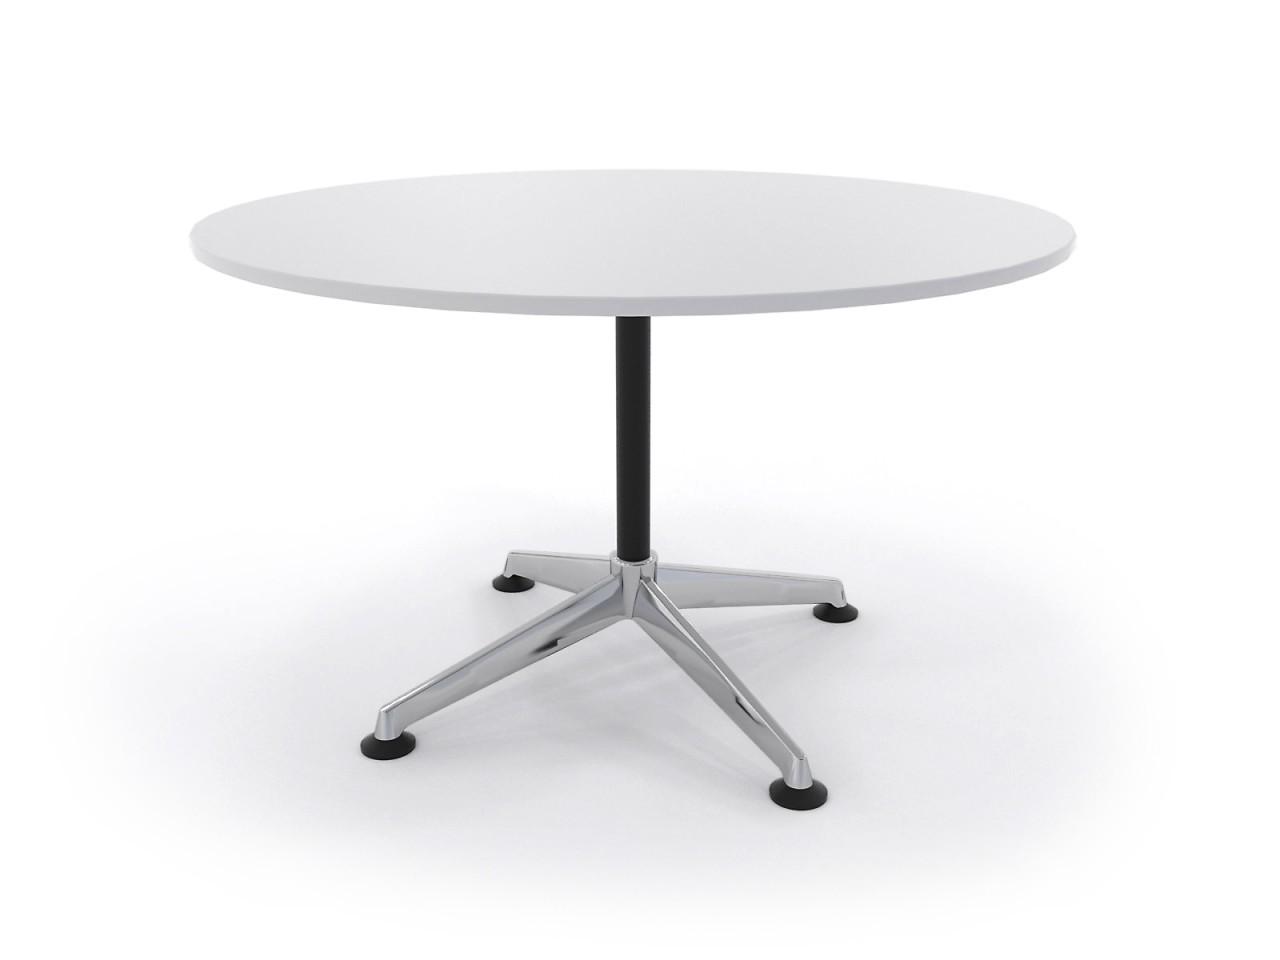 modulus-1200-pedestal-single-post-96632.1369269669.1280.128021312312.jpg